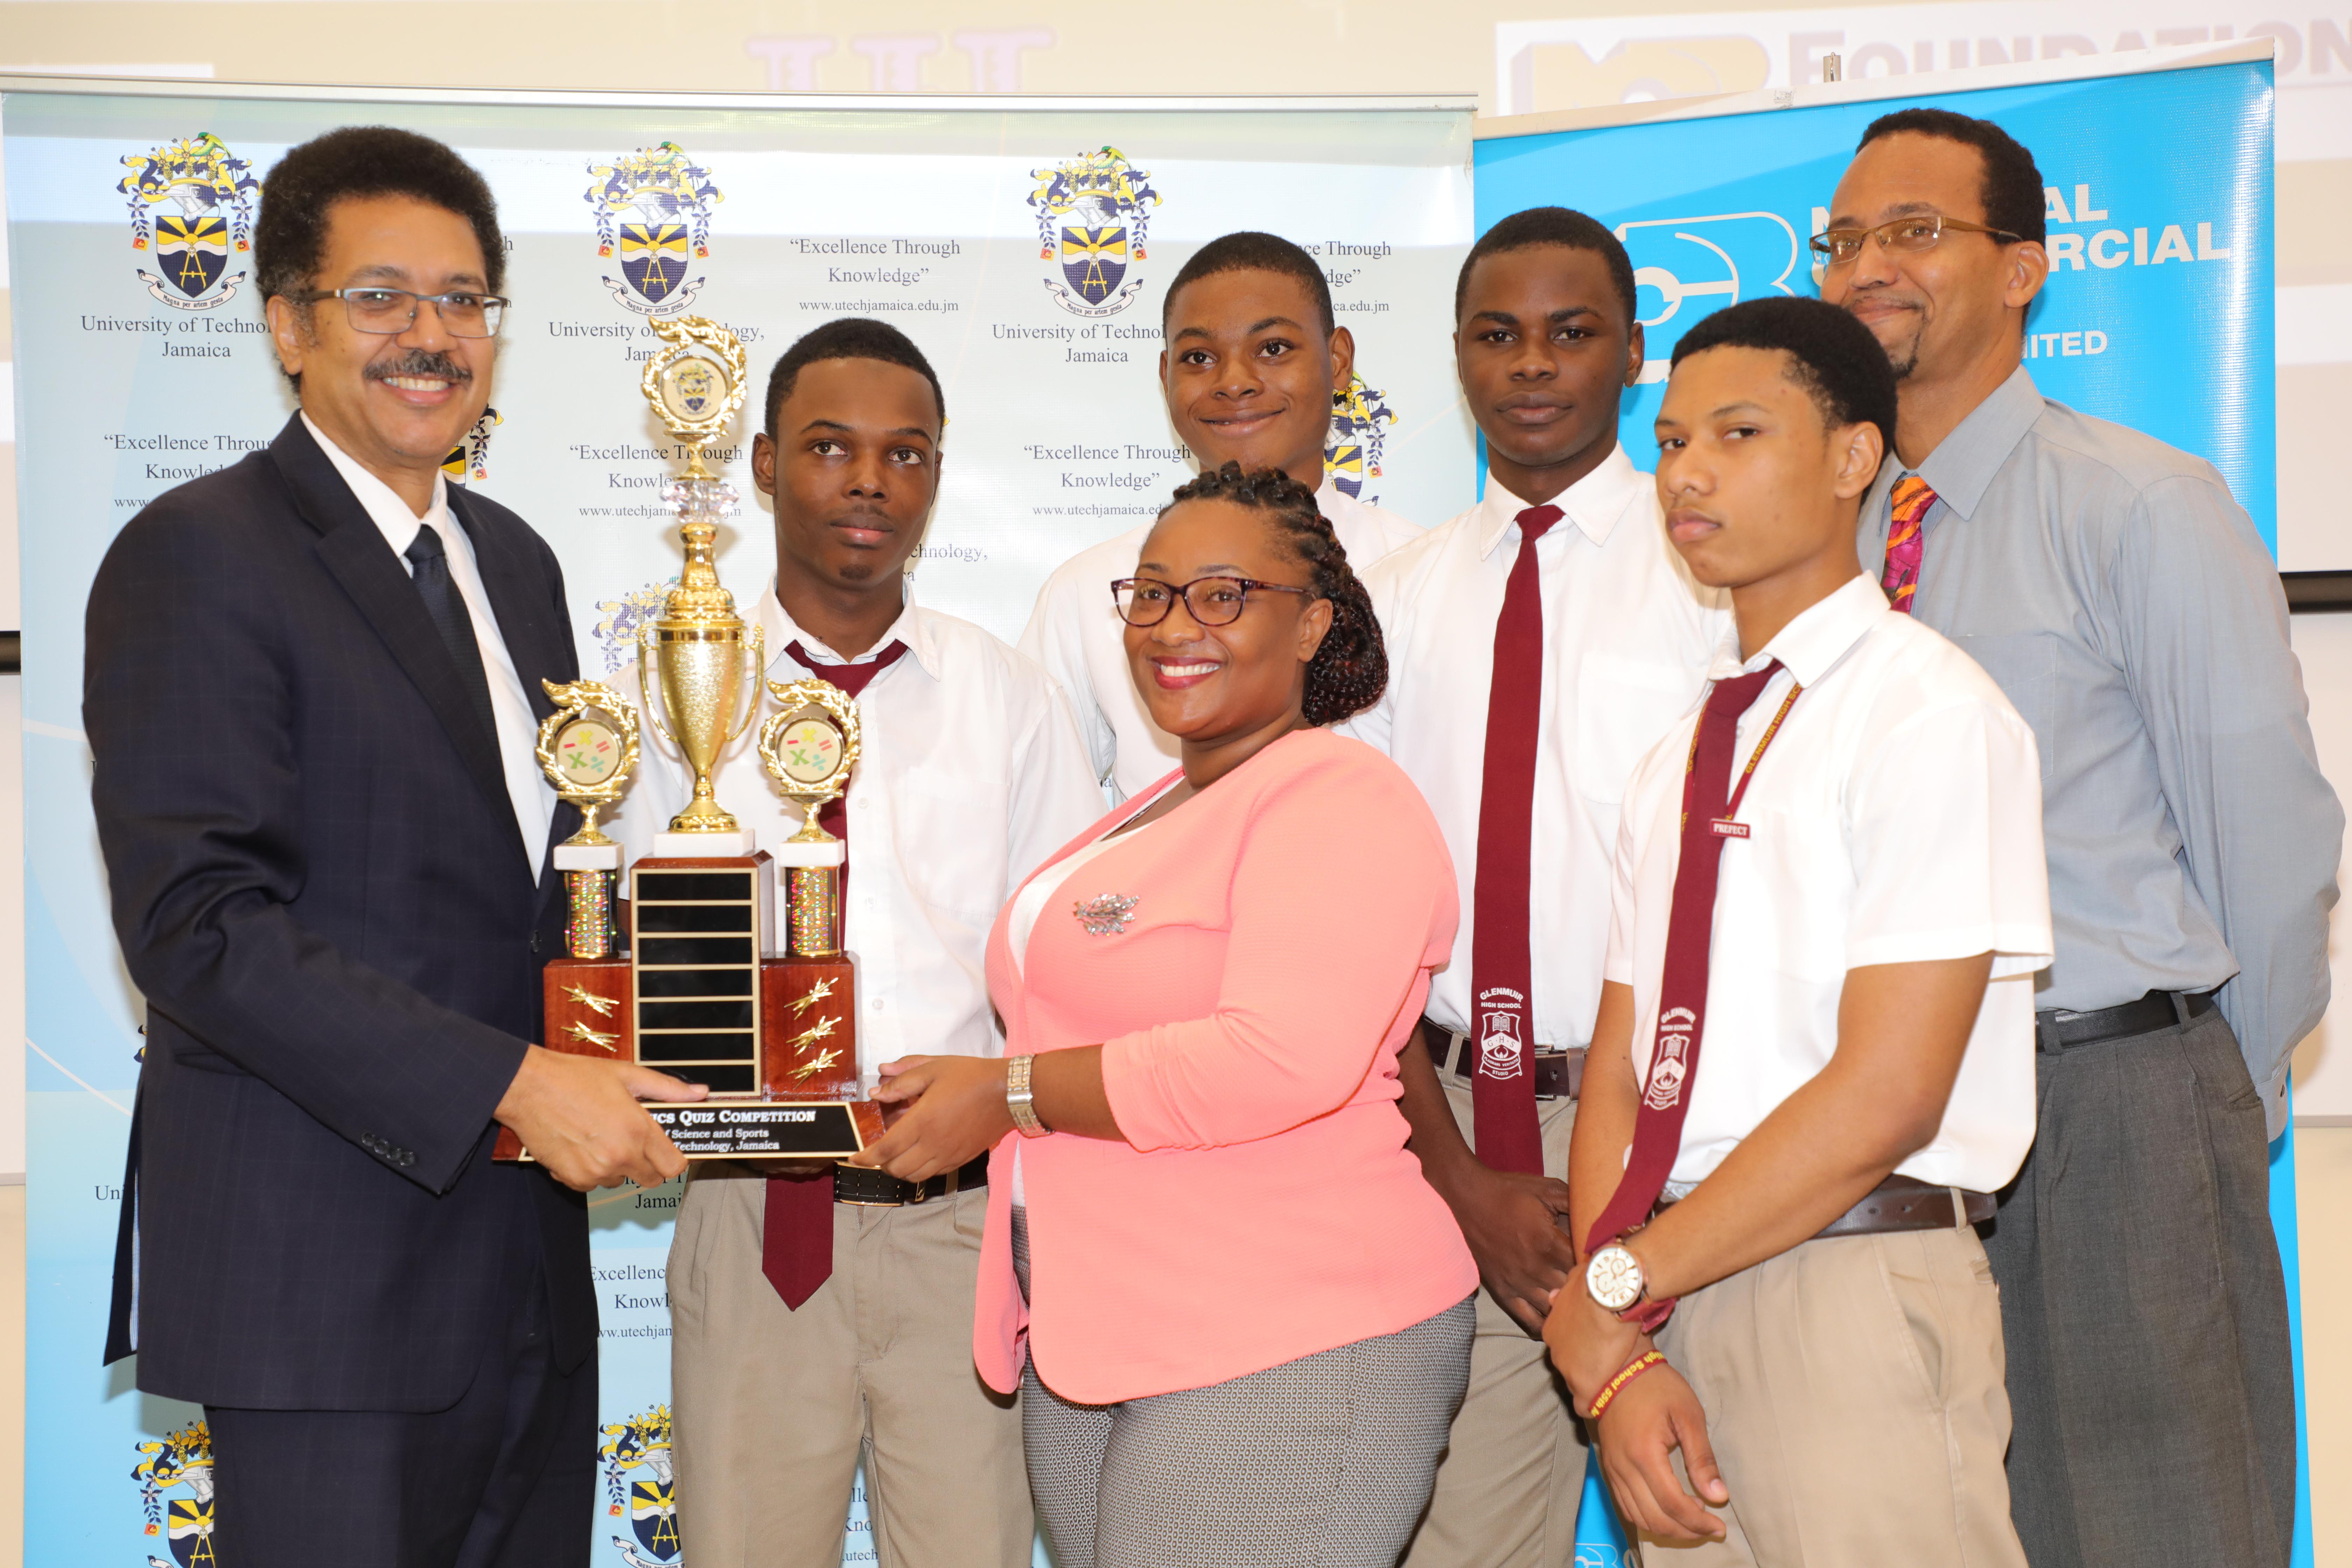 Glenmuir High School Wins Inaugural UTech, Jamaica Mathematics Quiz Competition